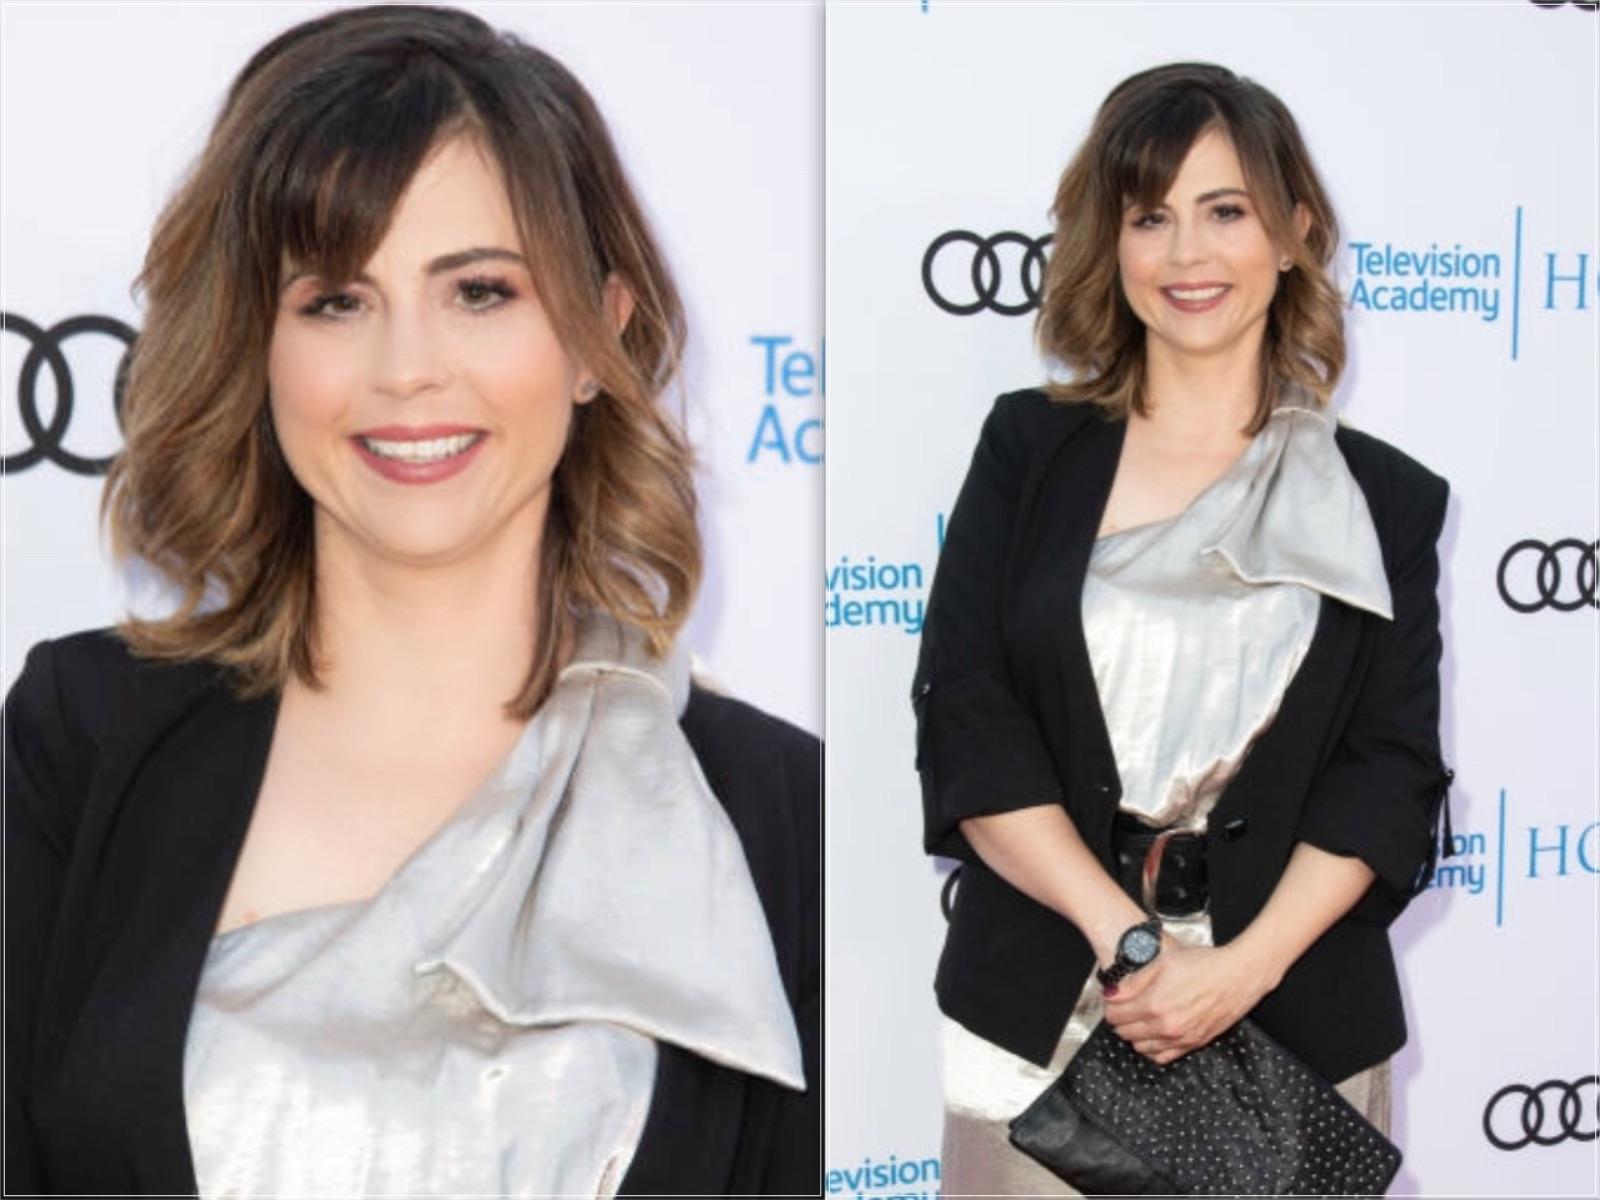 Mandy Teefey- TV academy awards.jpg